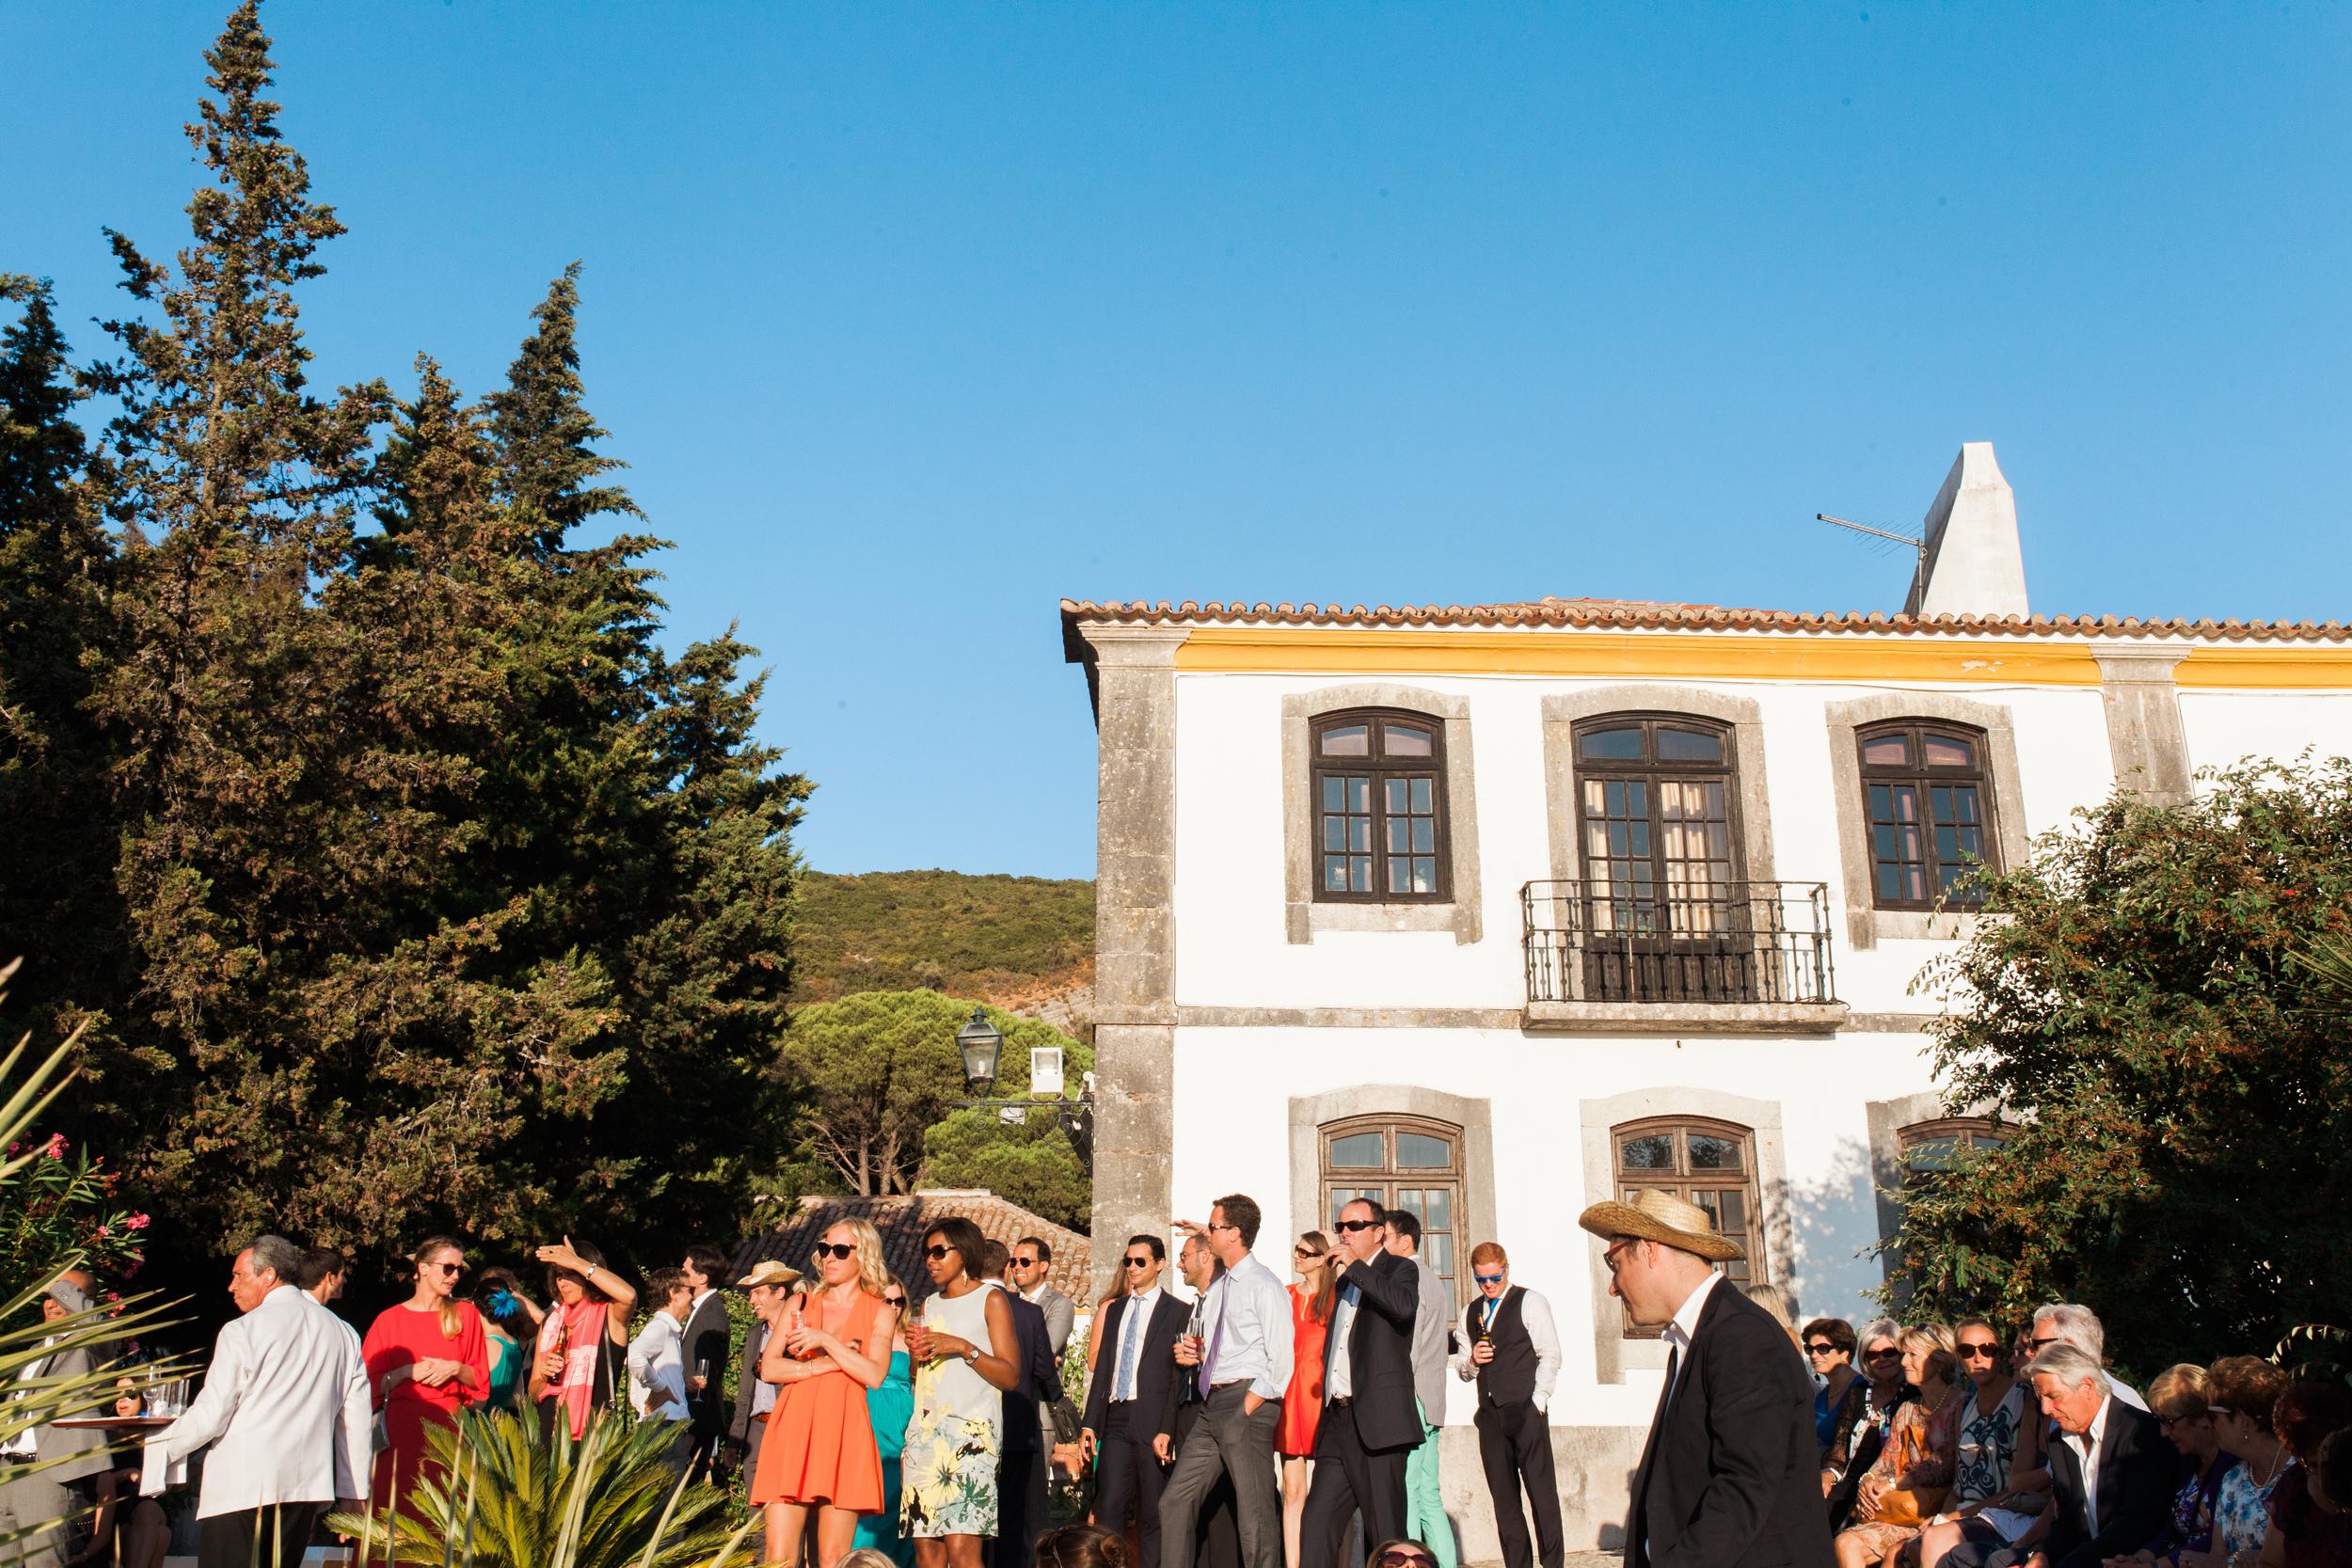 mariarao+wedding+quinta+del+carmen-512.jpg